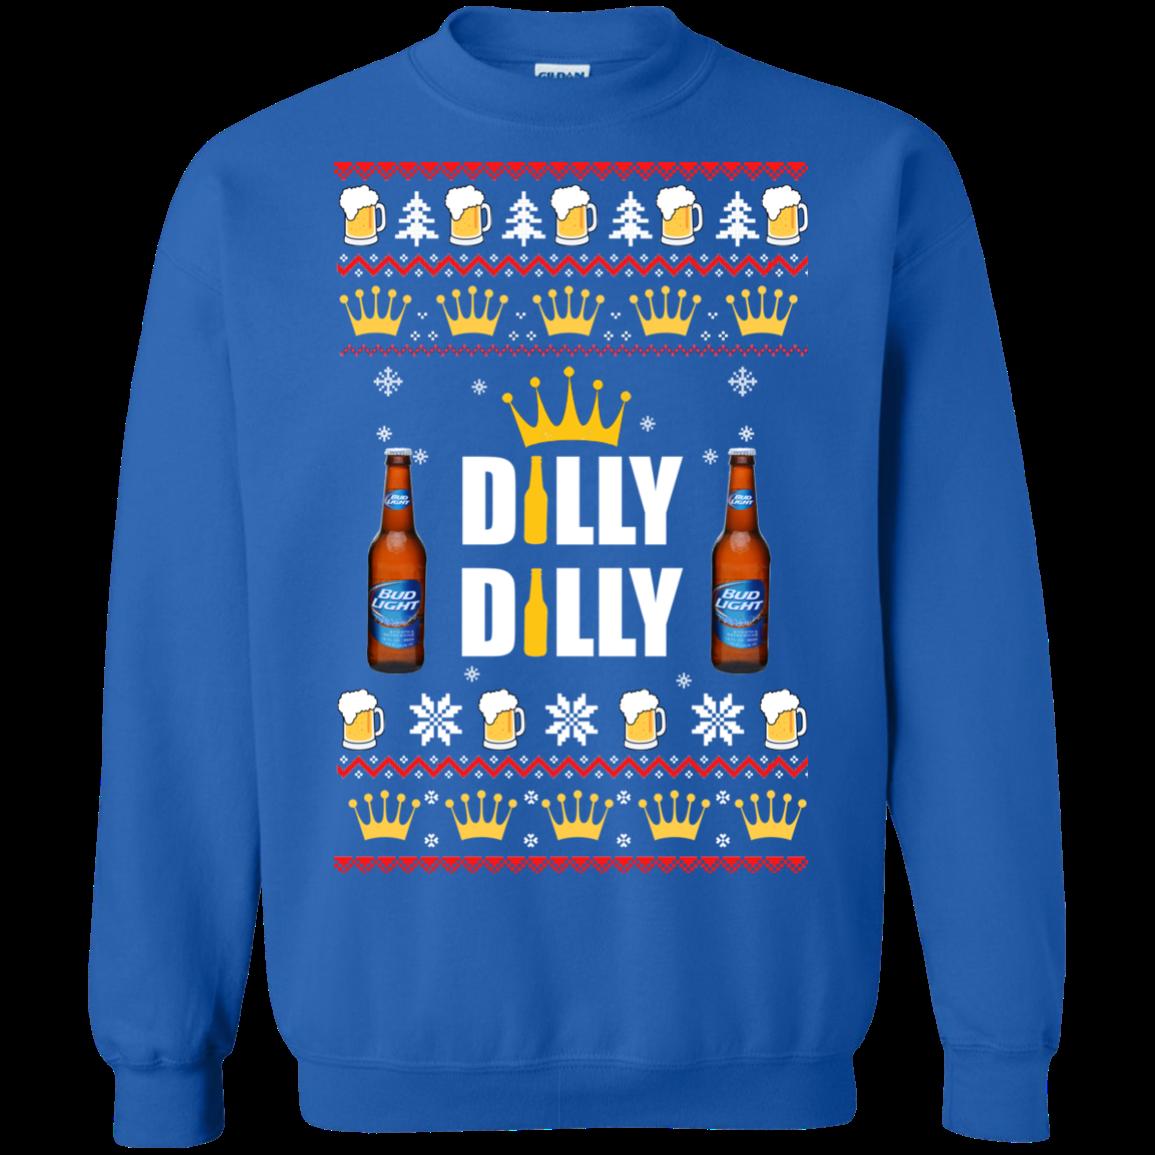 Bud Light Dilly Dilly Christmas Sweater Robinplacefabrics